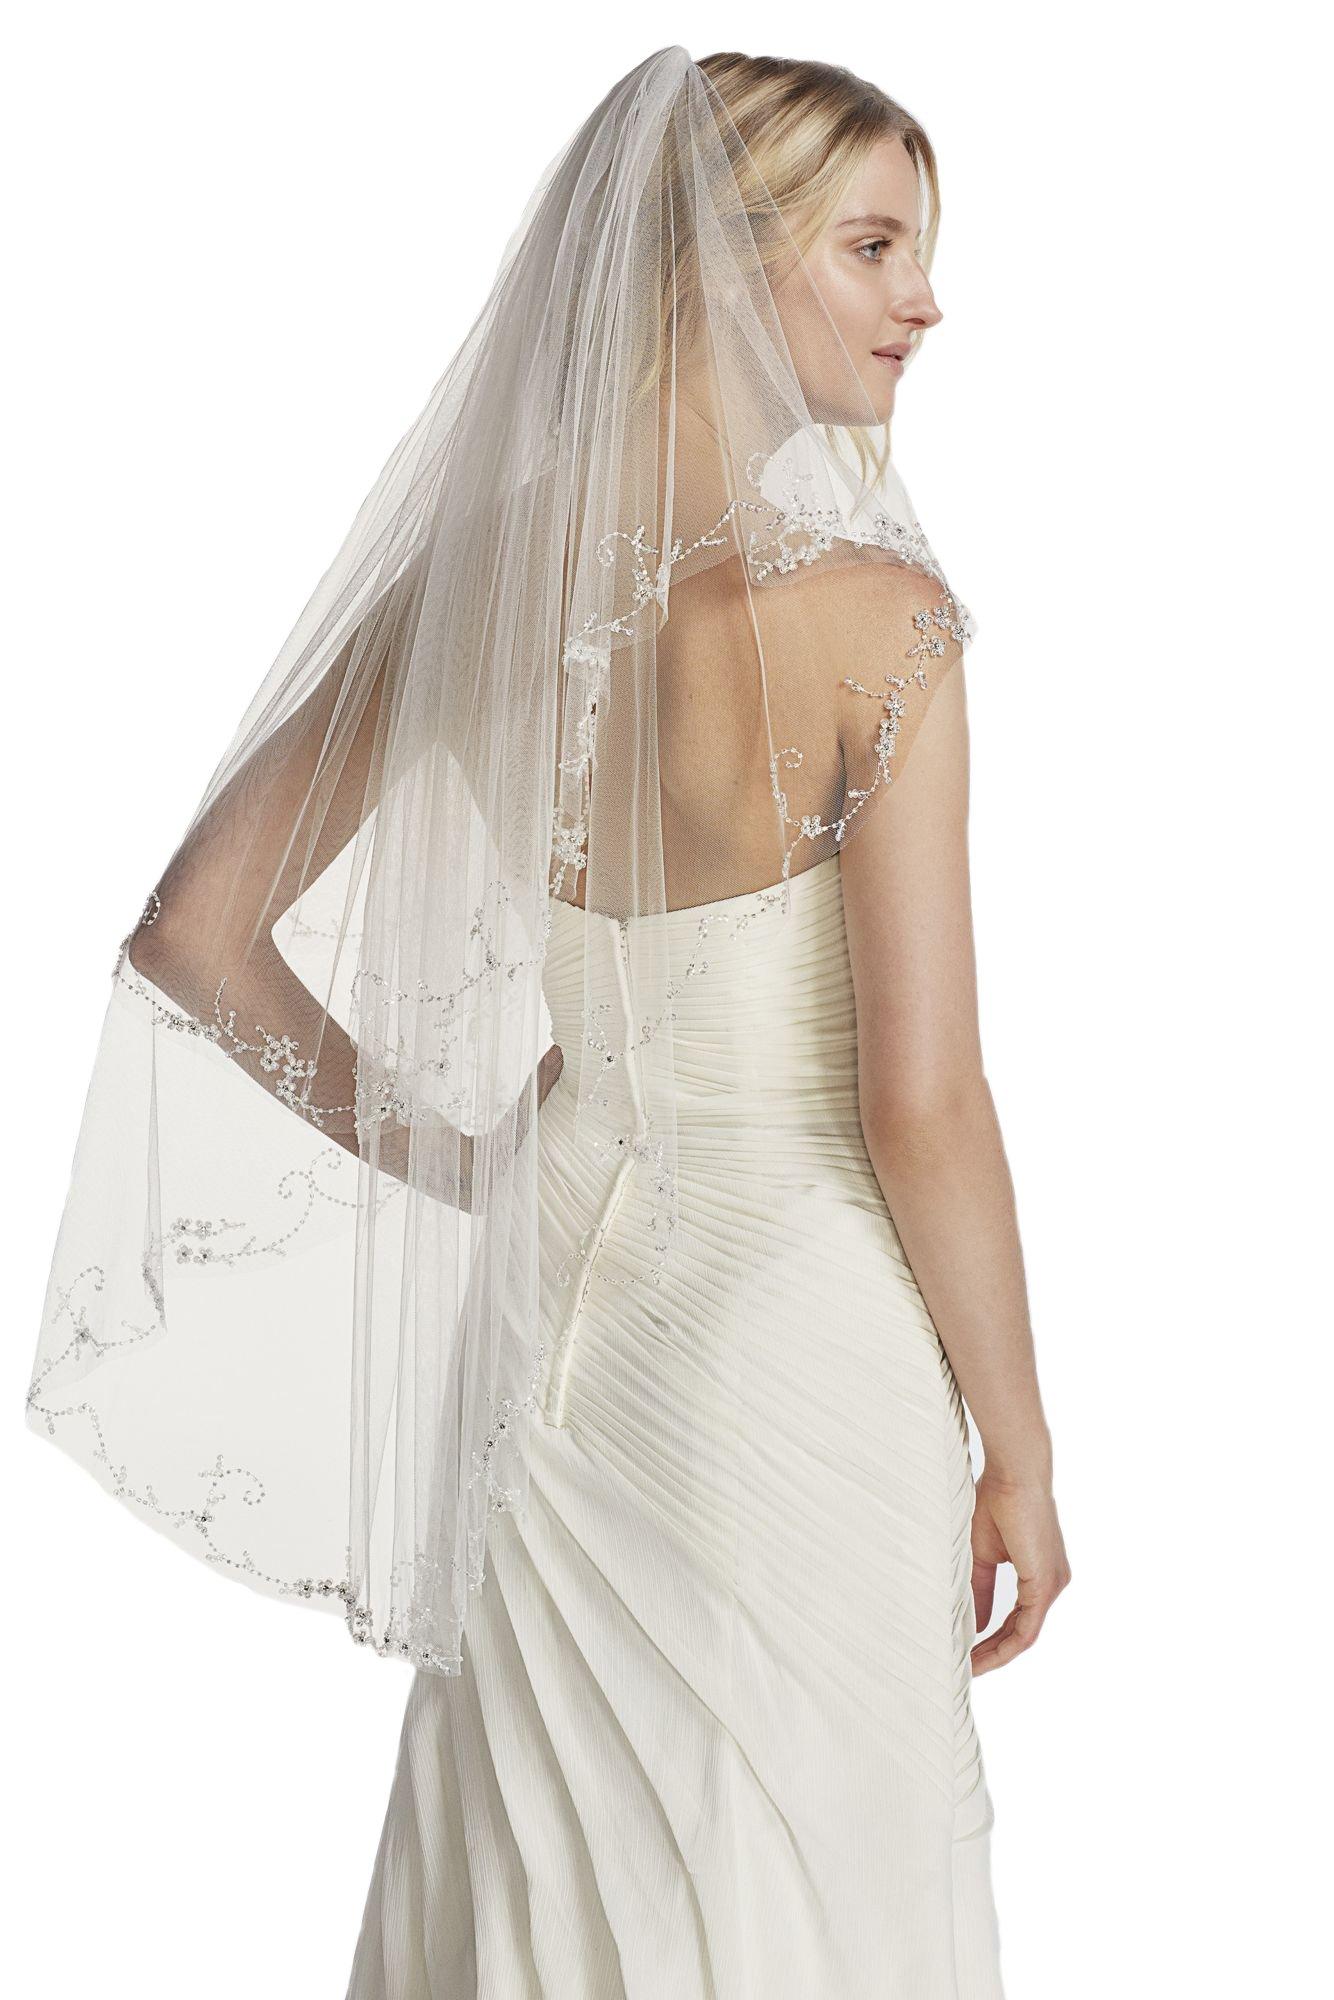 Passat Diamond White Two-Tier 36'' Fingertip Wedding Bridal Veil DB133